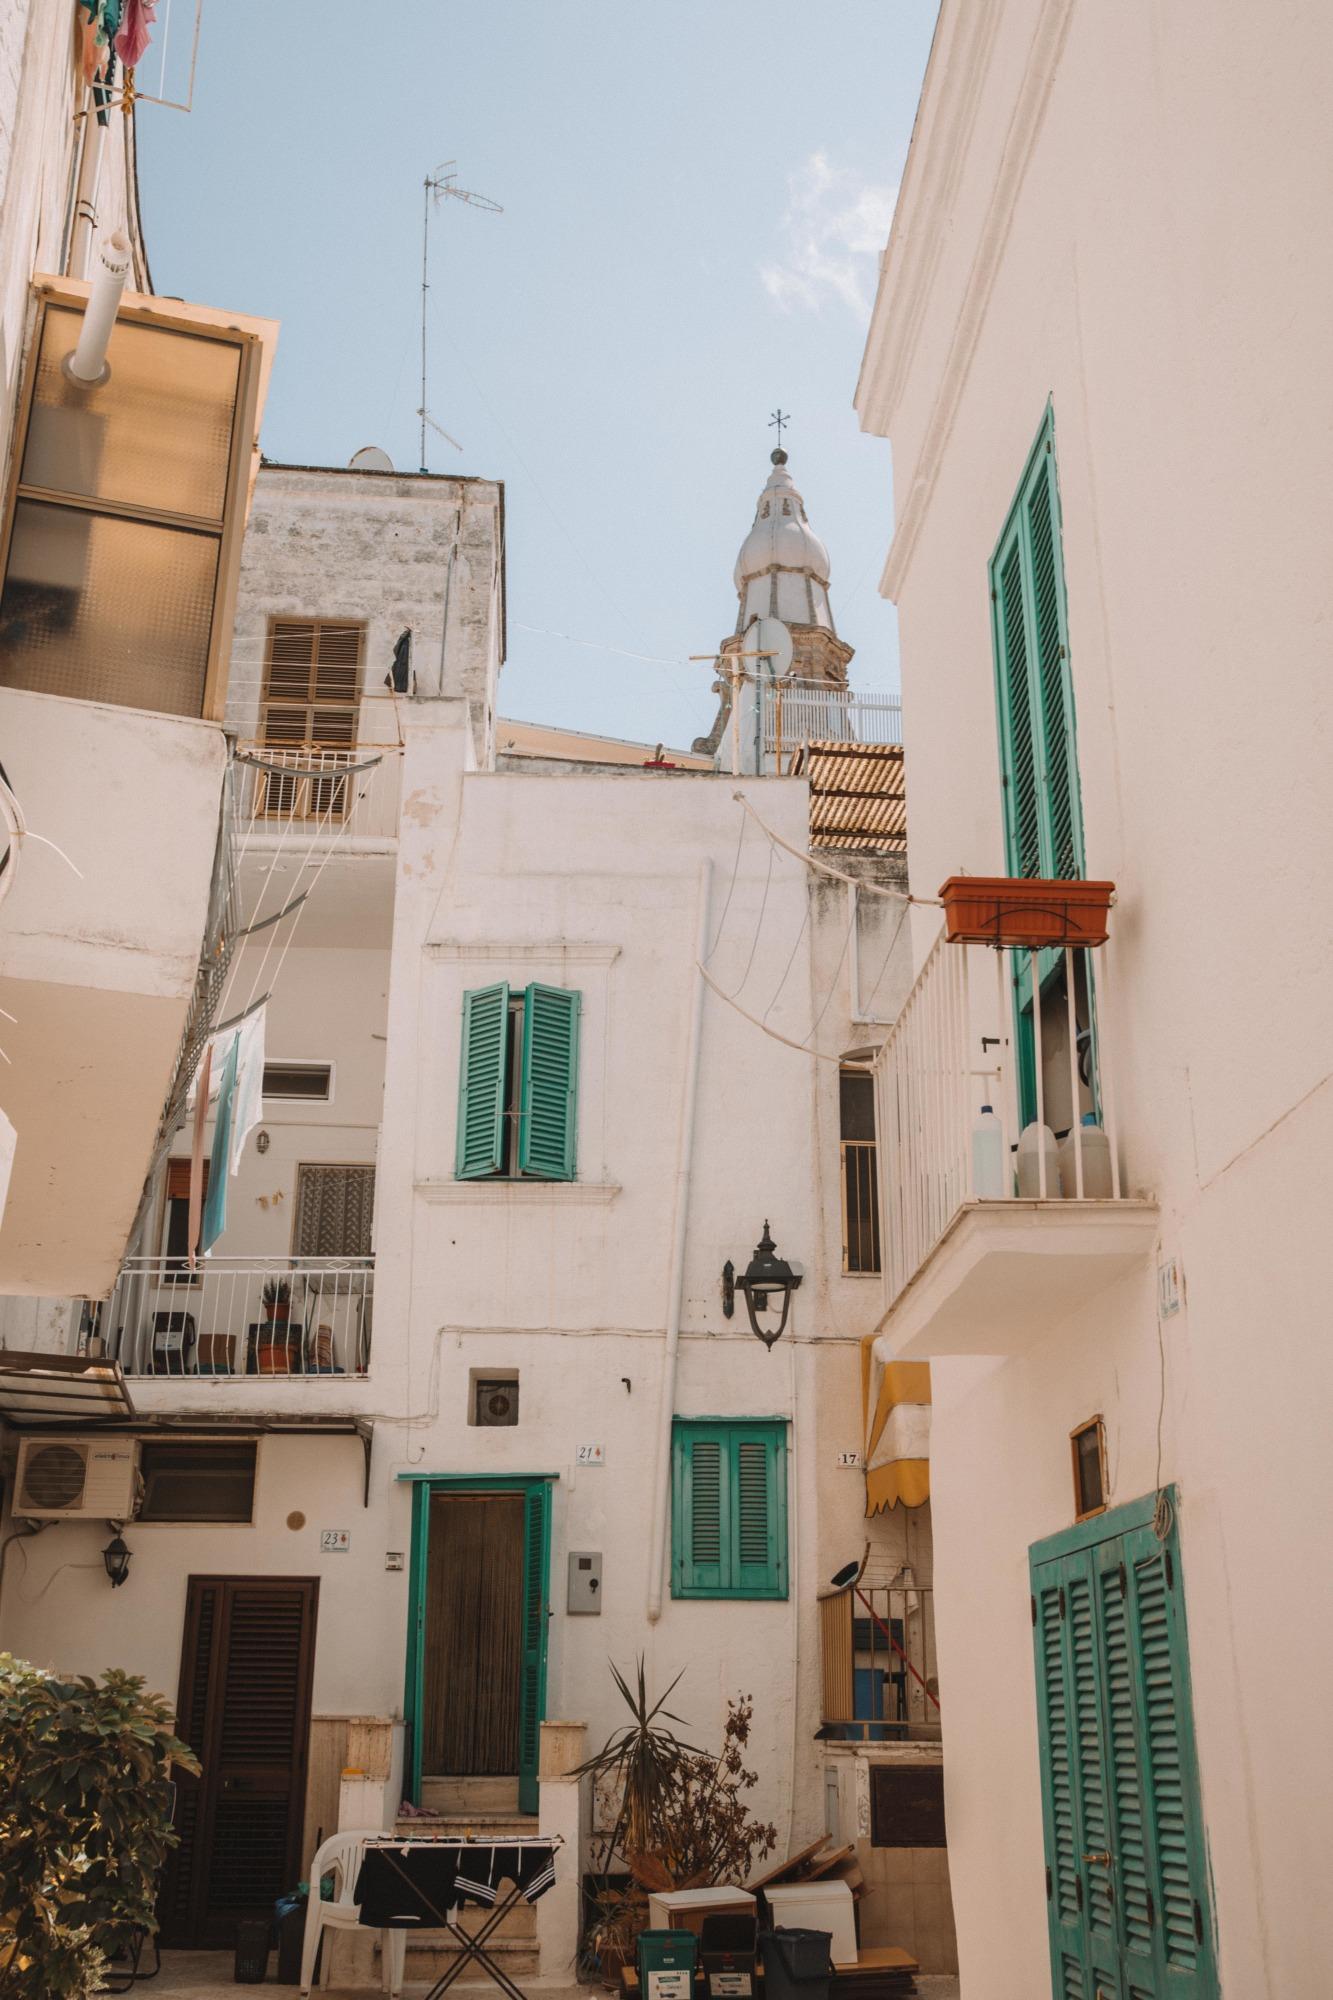 Village Monopoli Puglia - Blondie Baby blog voyages